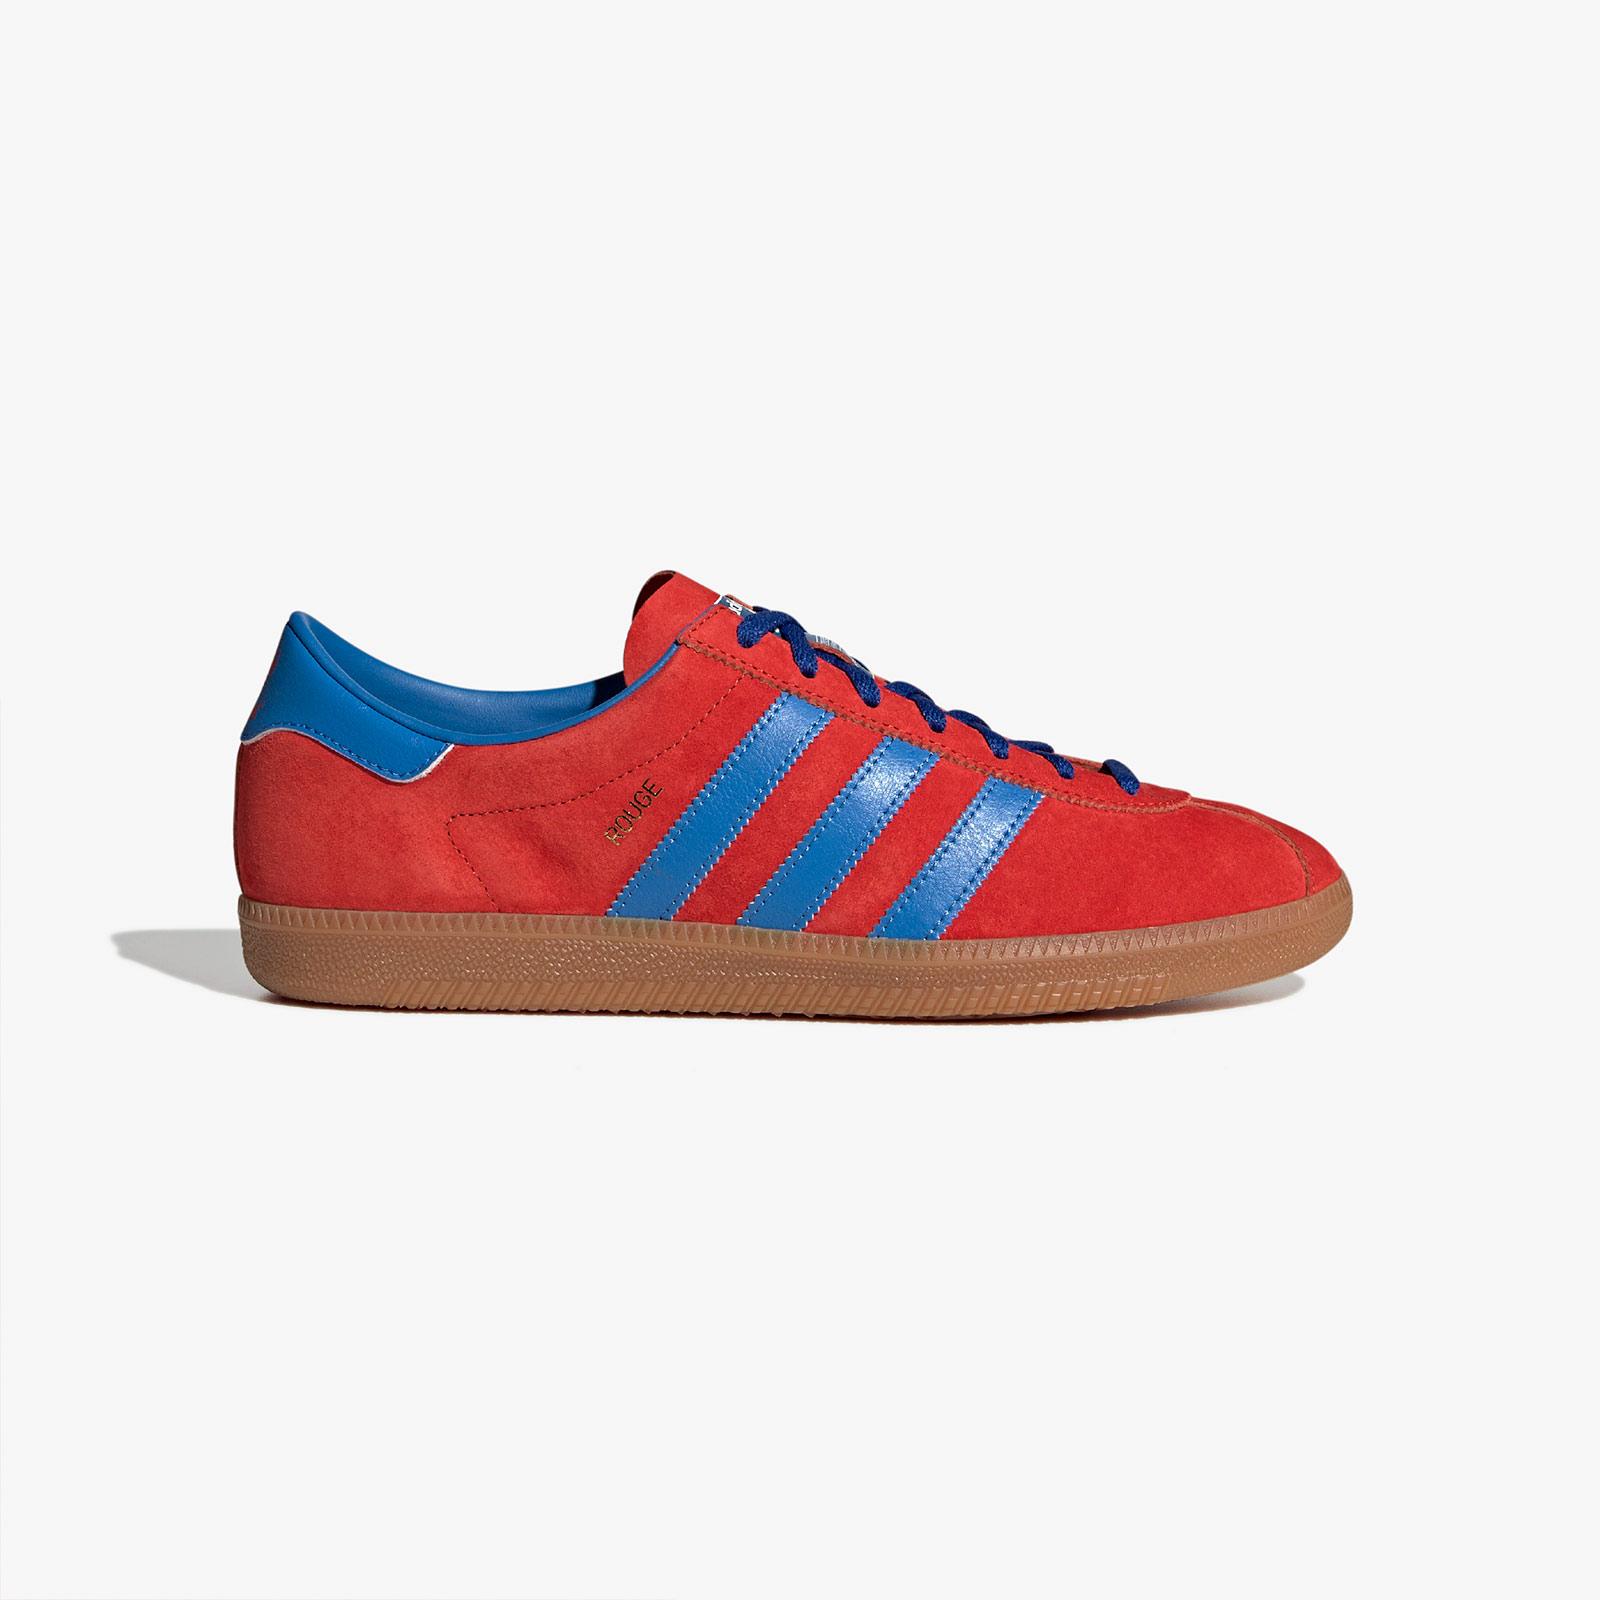 adidas Rouge - H01797 - SNS | sneakers & streetwear online since 1999